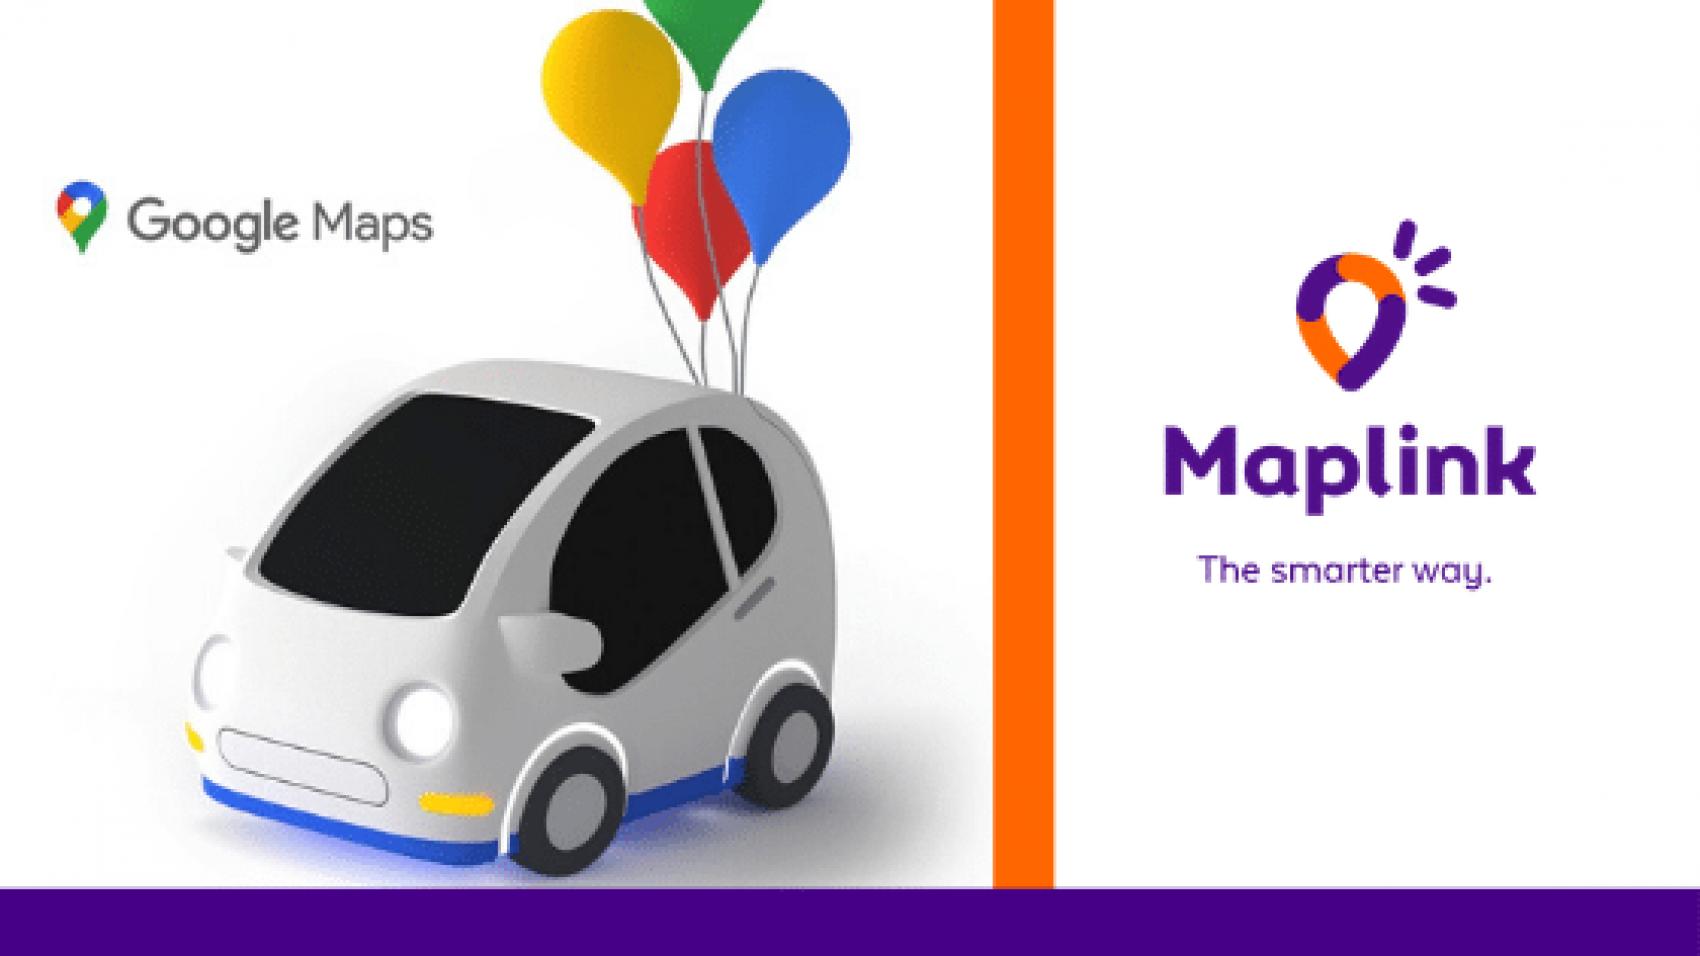 Maplink 15 anos Google Maps (1)